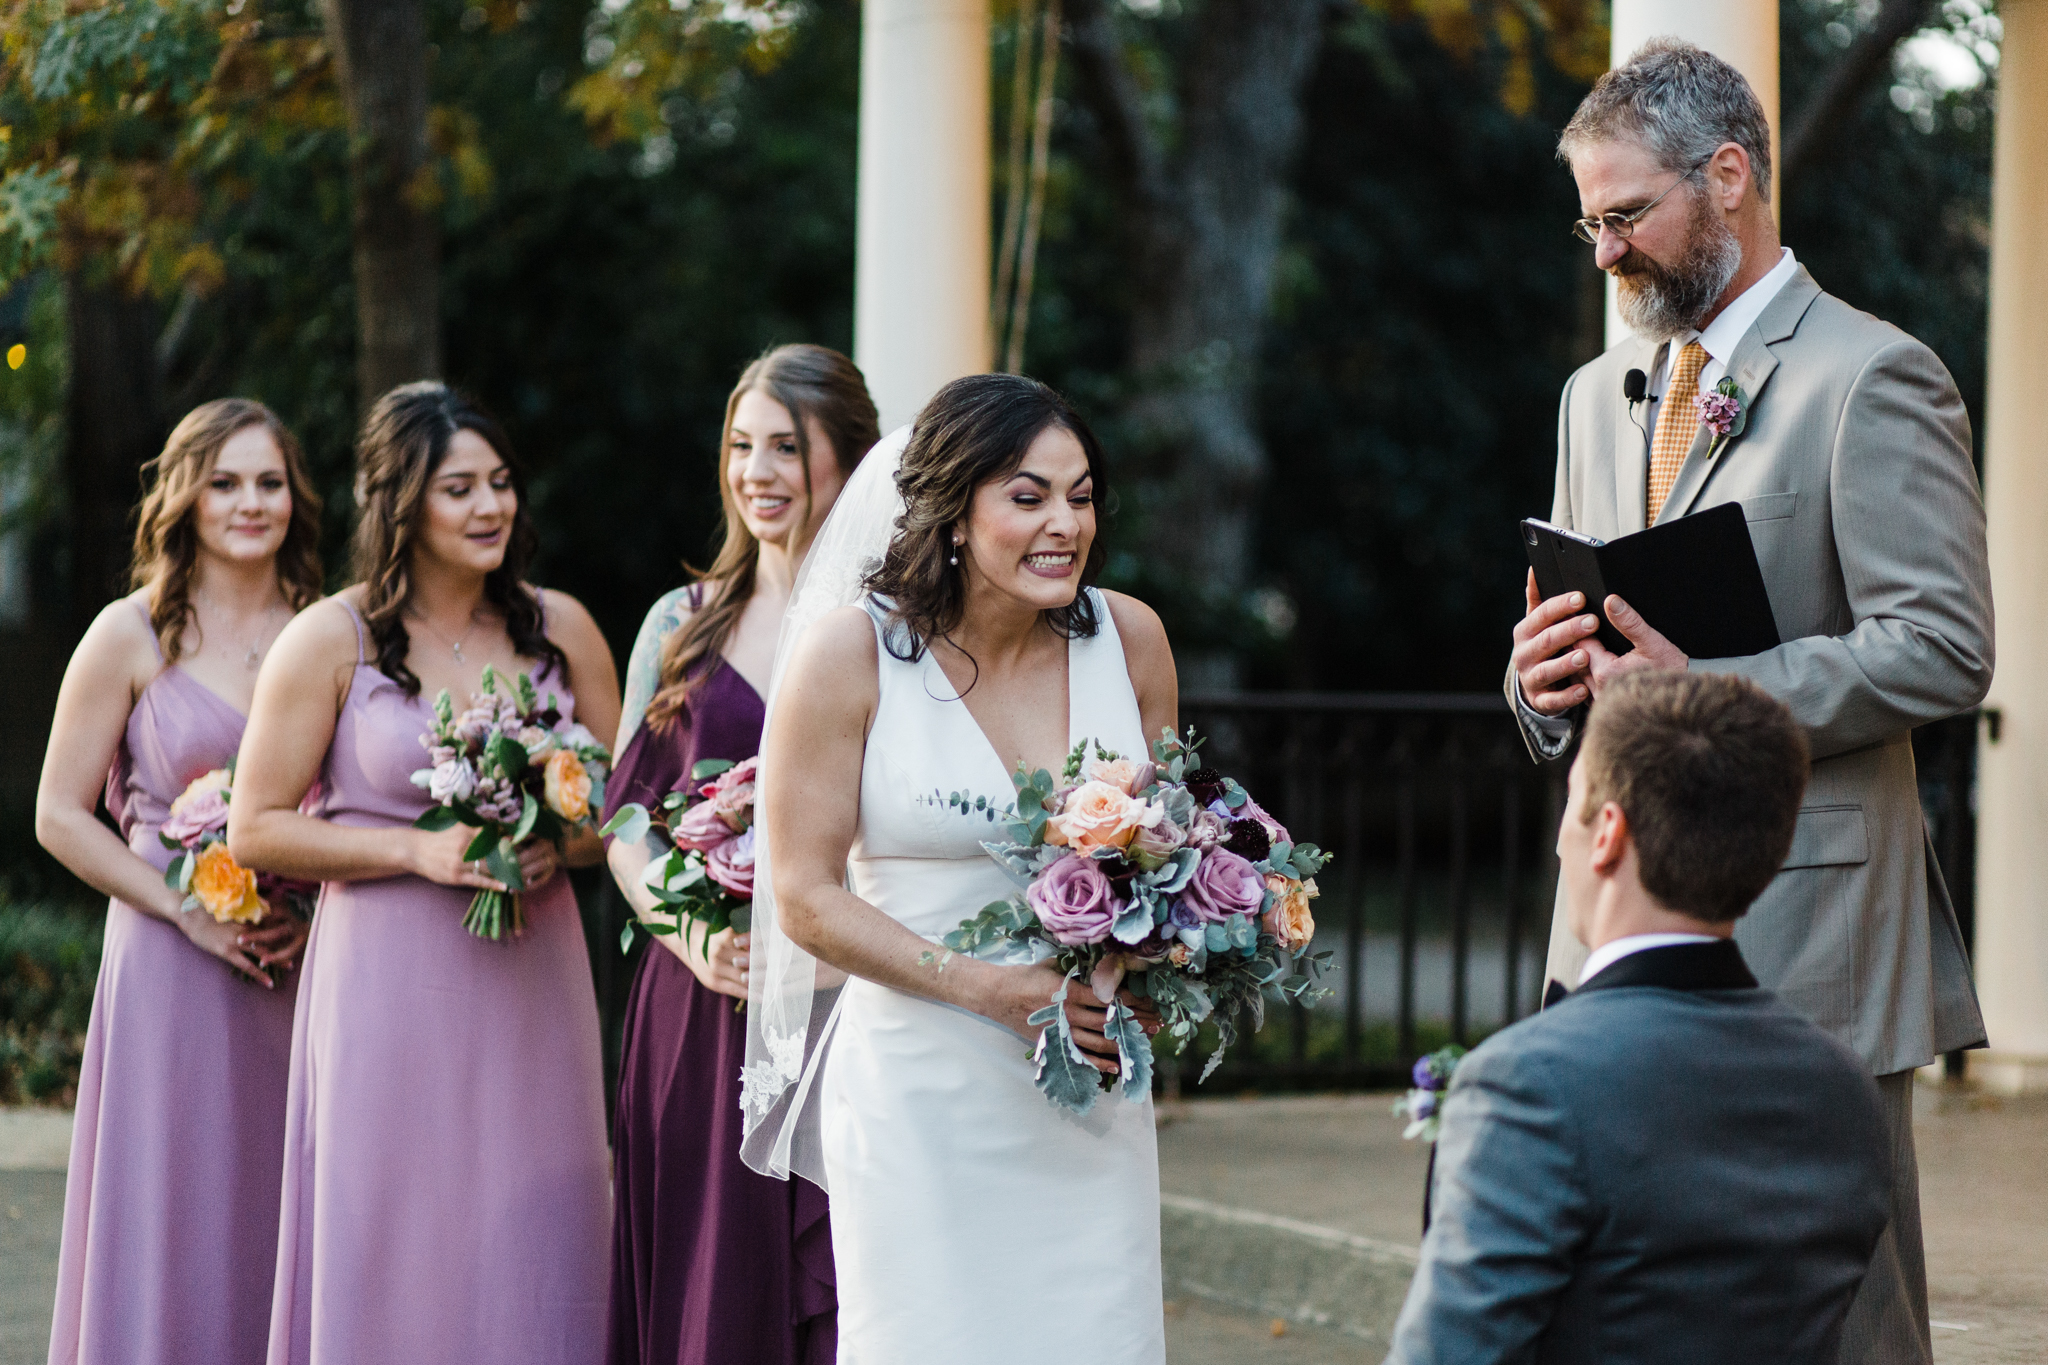 wedding ceremony bride smiling